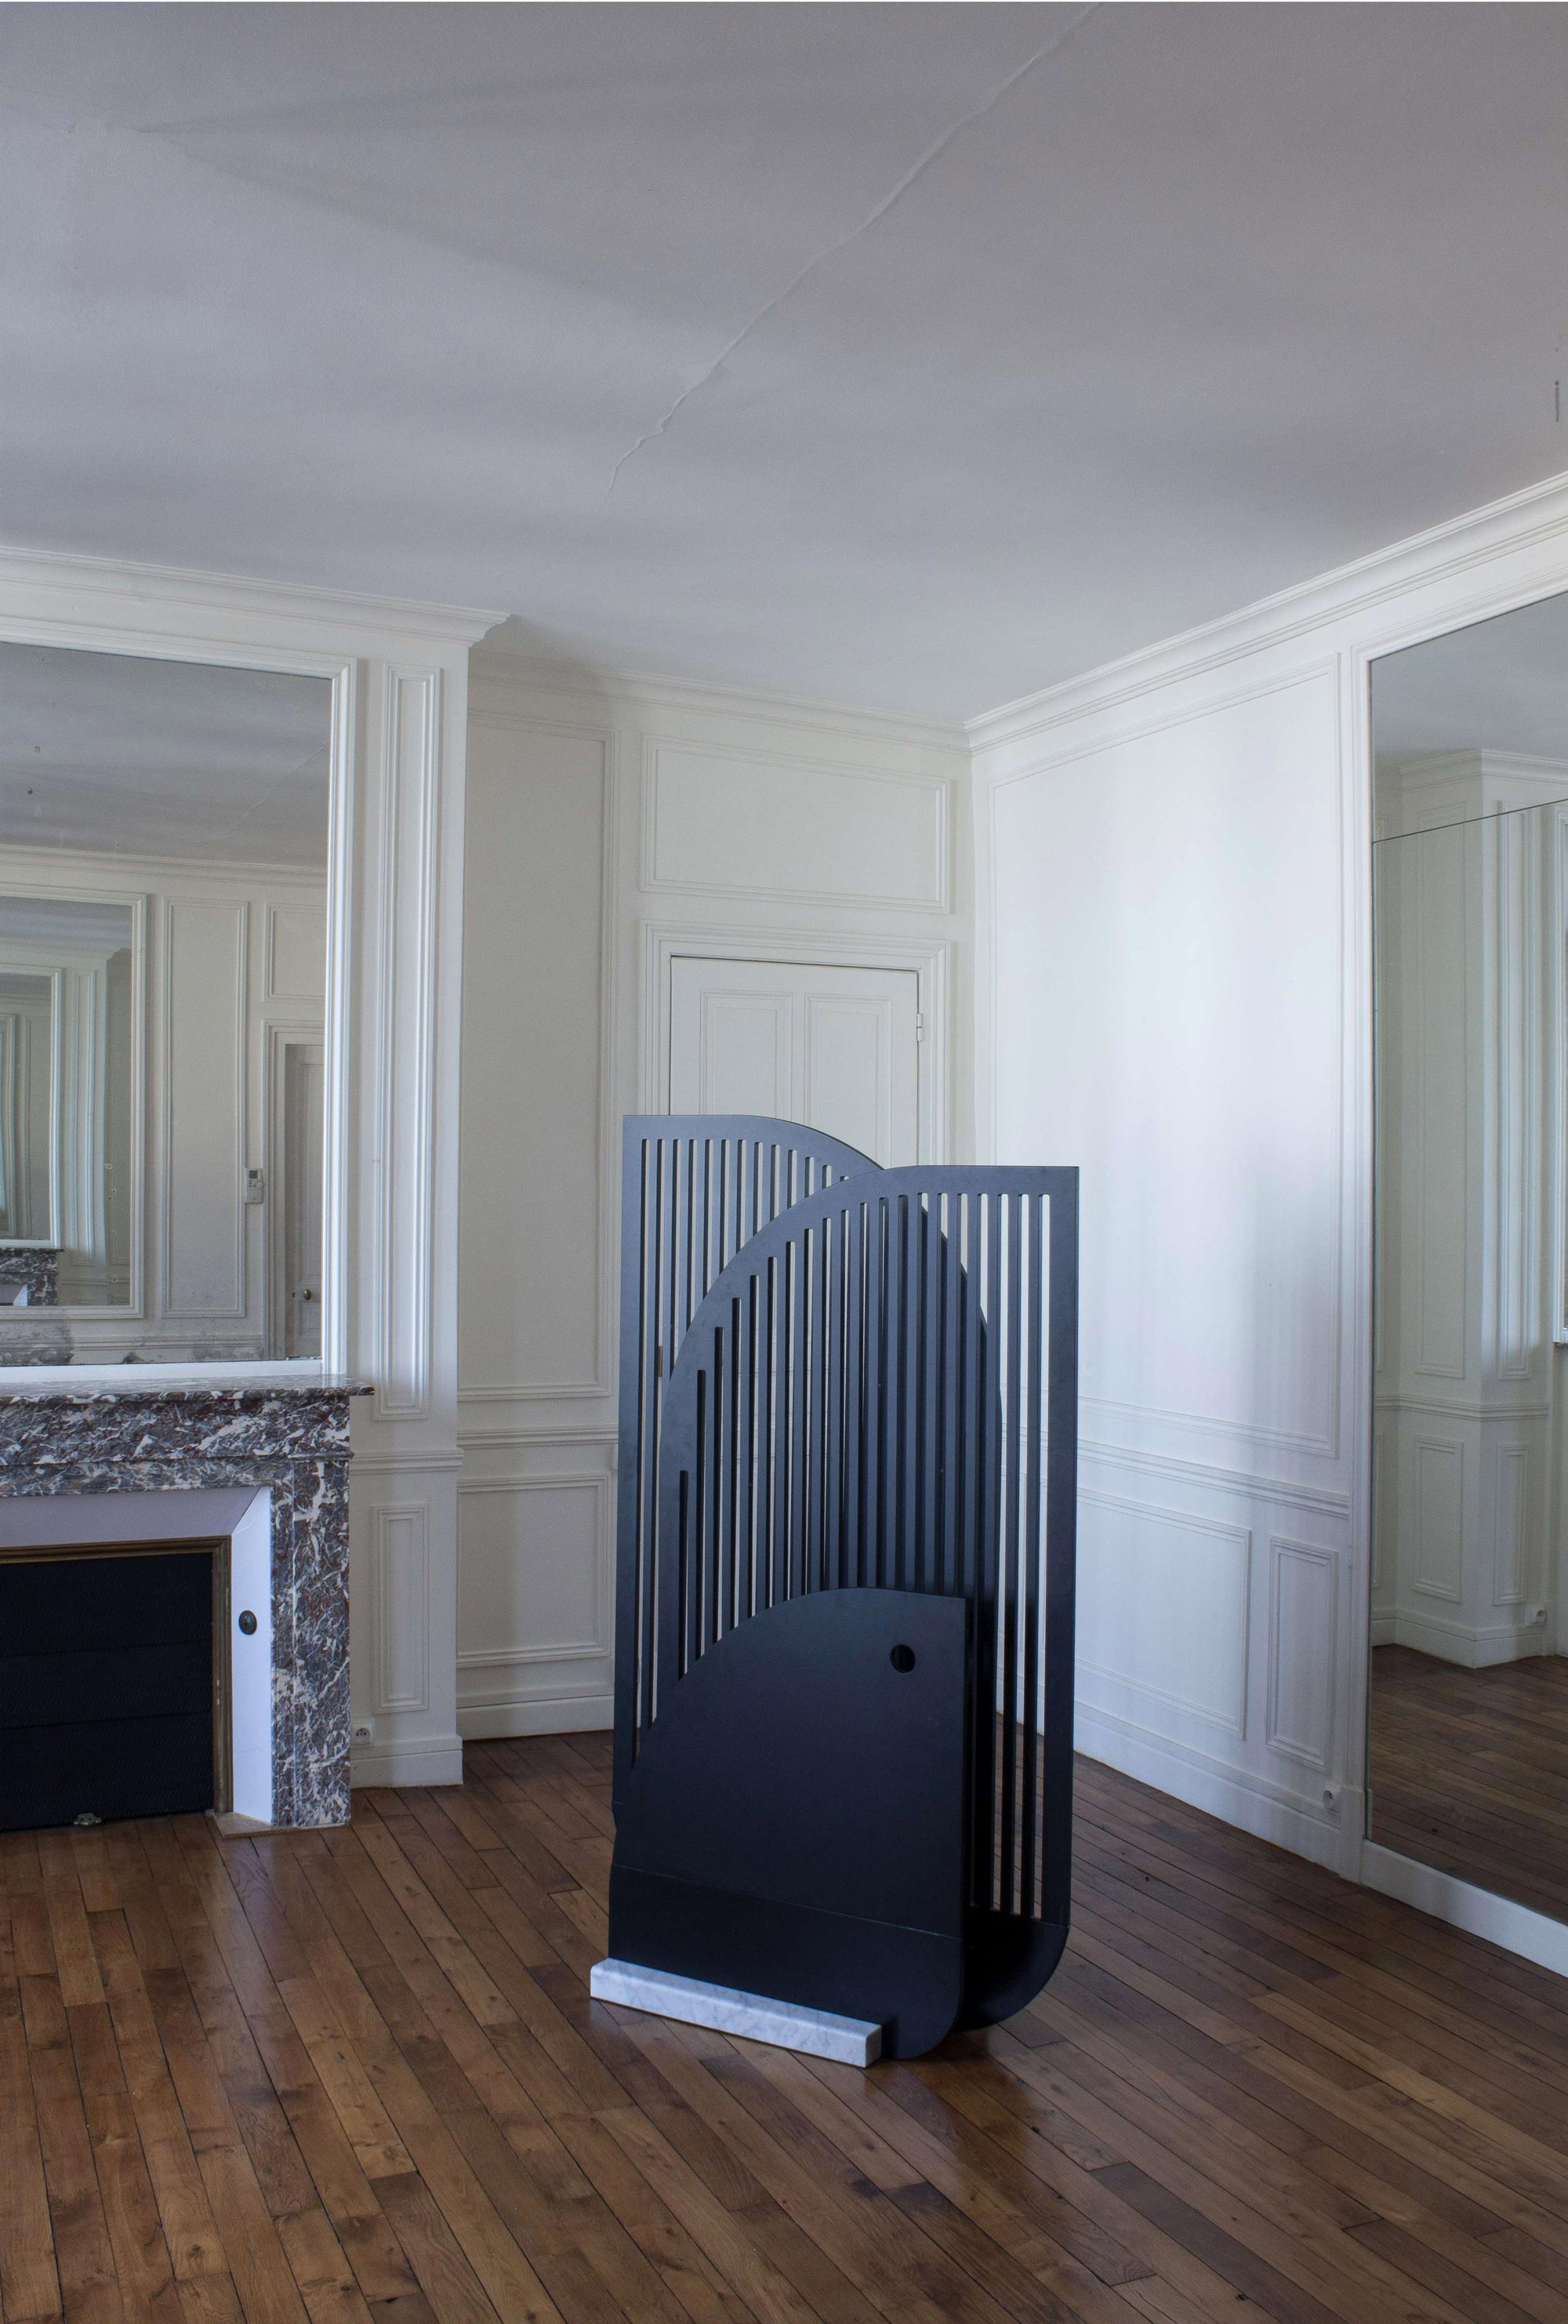 maison du paravent elegant gallery of paravent rose u gris with maison du paravent with maison. Black Bedroom Furniture Sets. Home Design Ideas